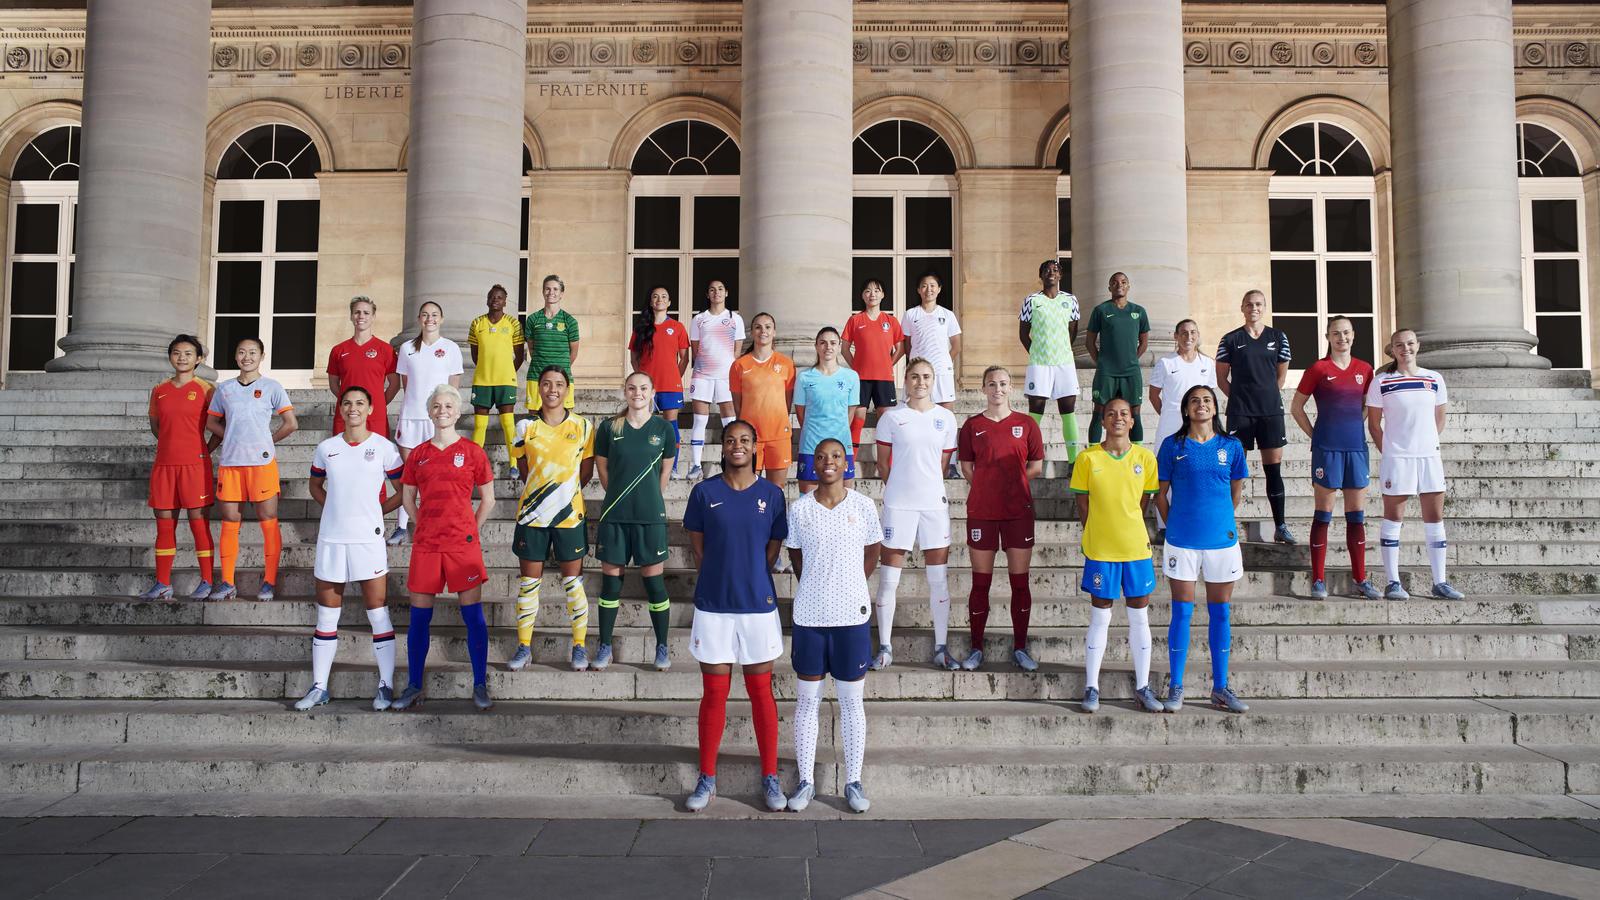 Nike-National-Team-Kit-Group-Paris-Elaine-Constantine-1_hd_1600.jpg